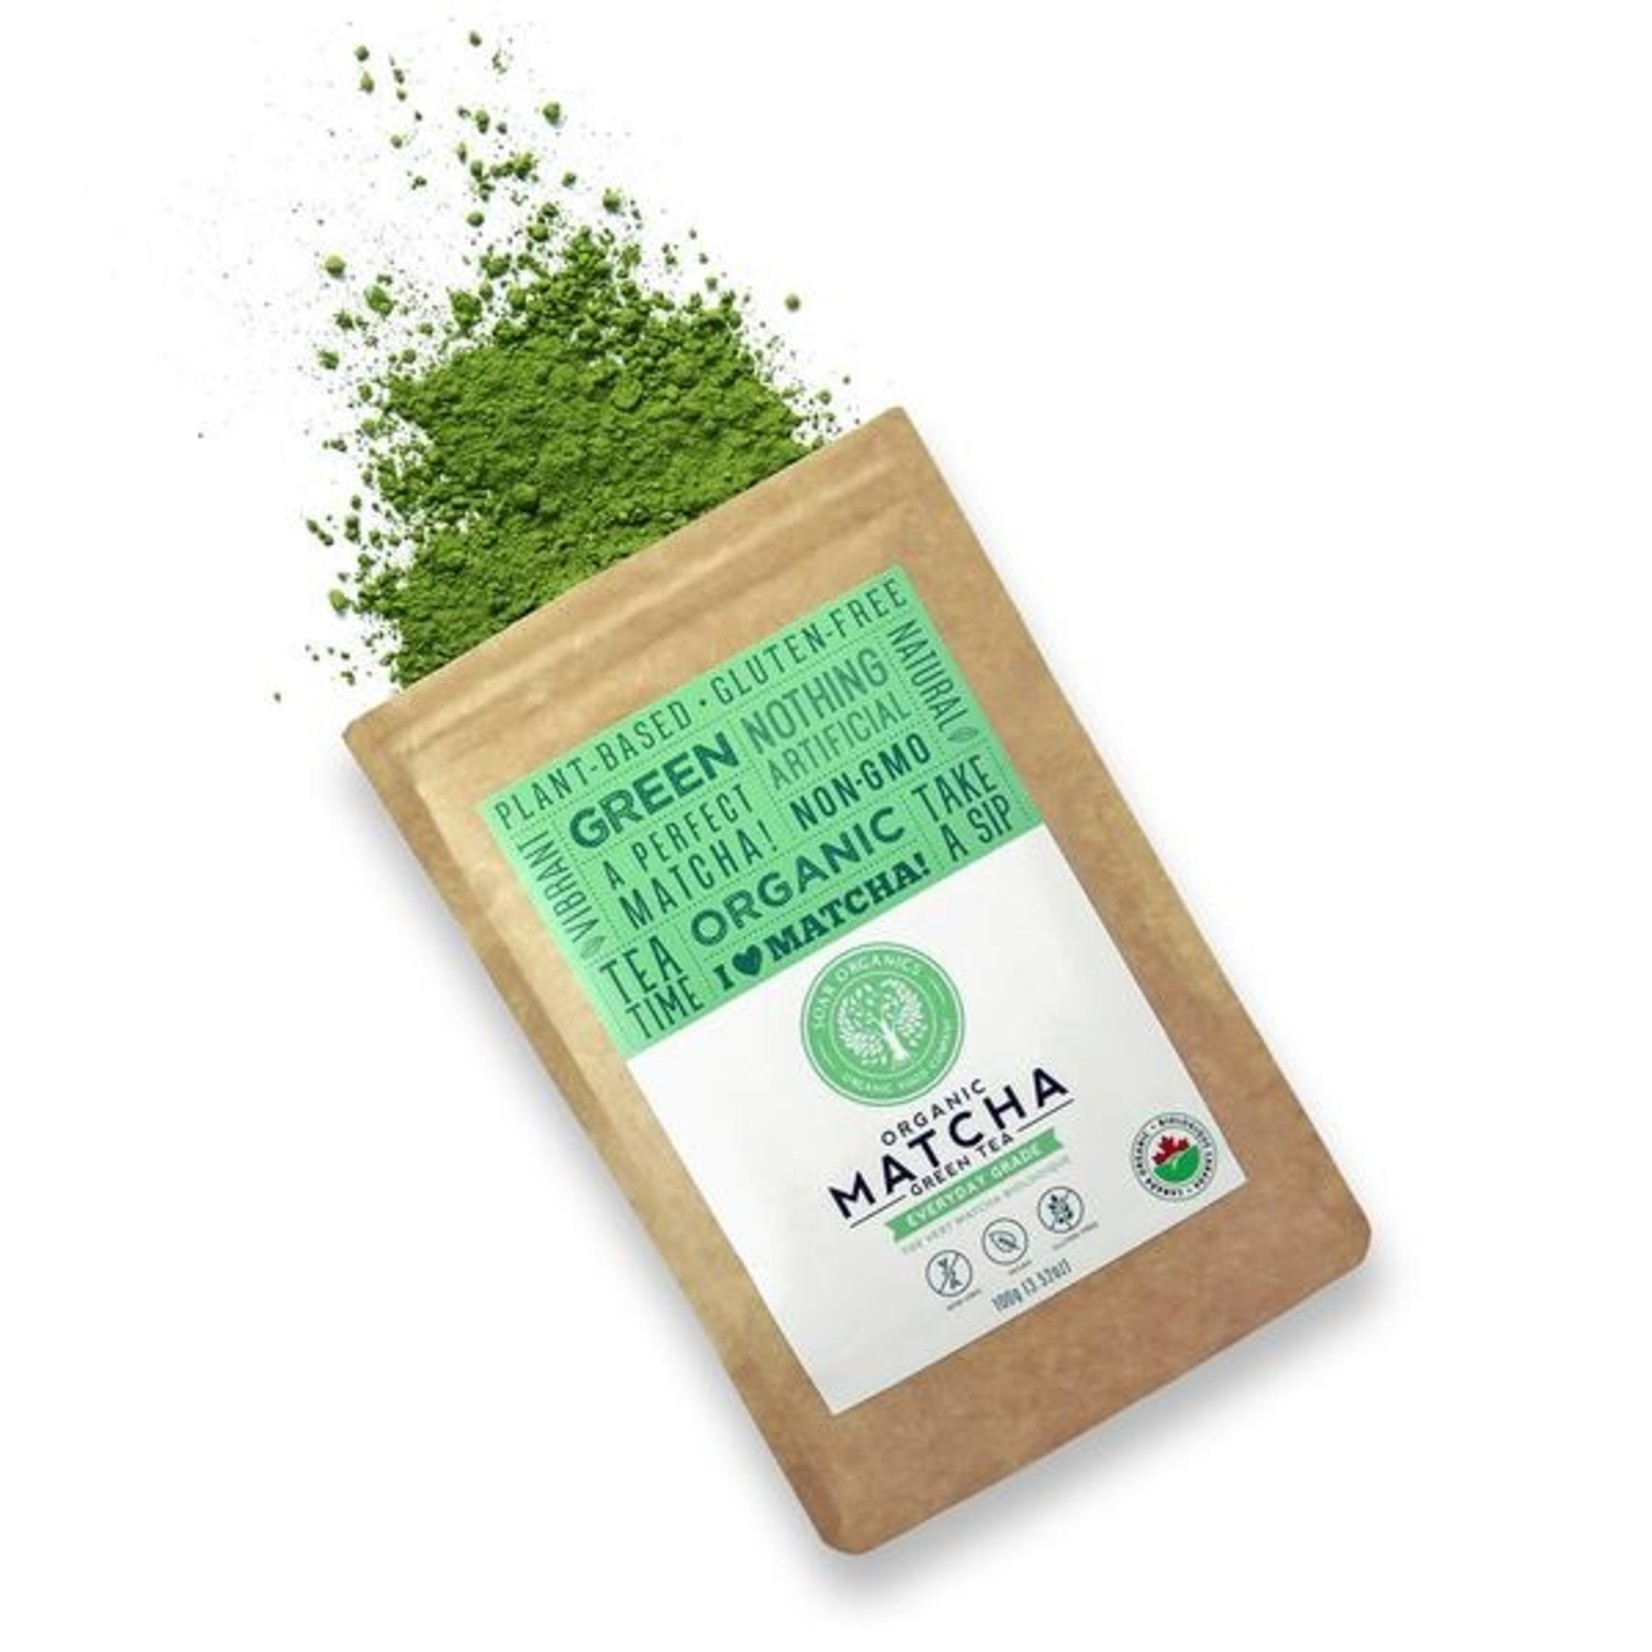 Soar Organics Organic Matcha Green Tea Everyday Grade 100g